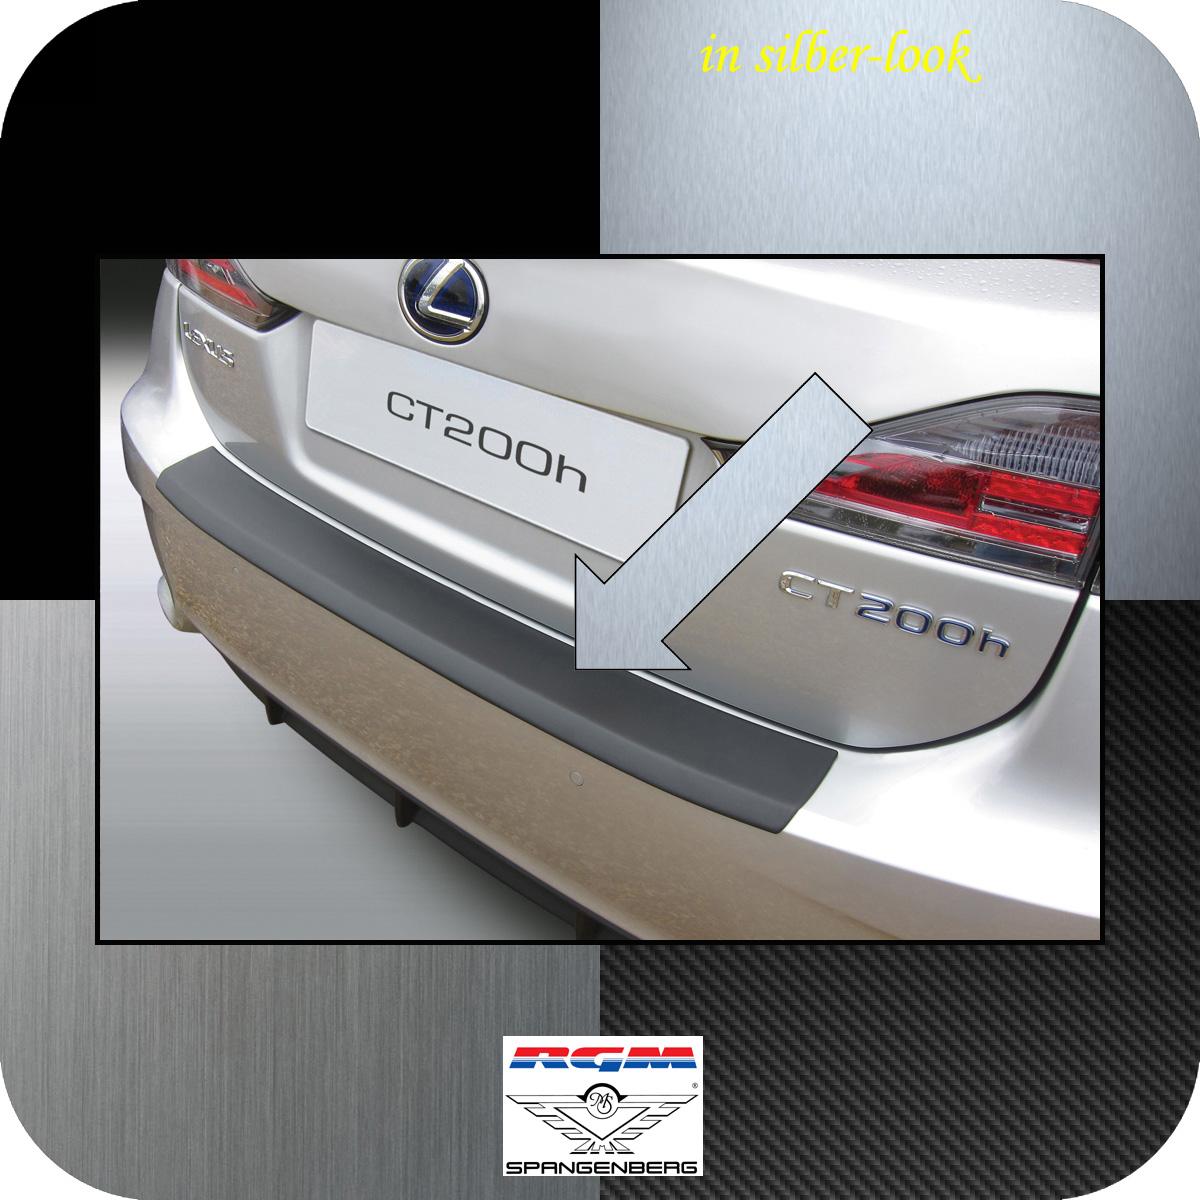 Ladekantenschutz Silber-Look Lexus CT 200h 5-Türer ab facelift 2014- 3506728